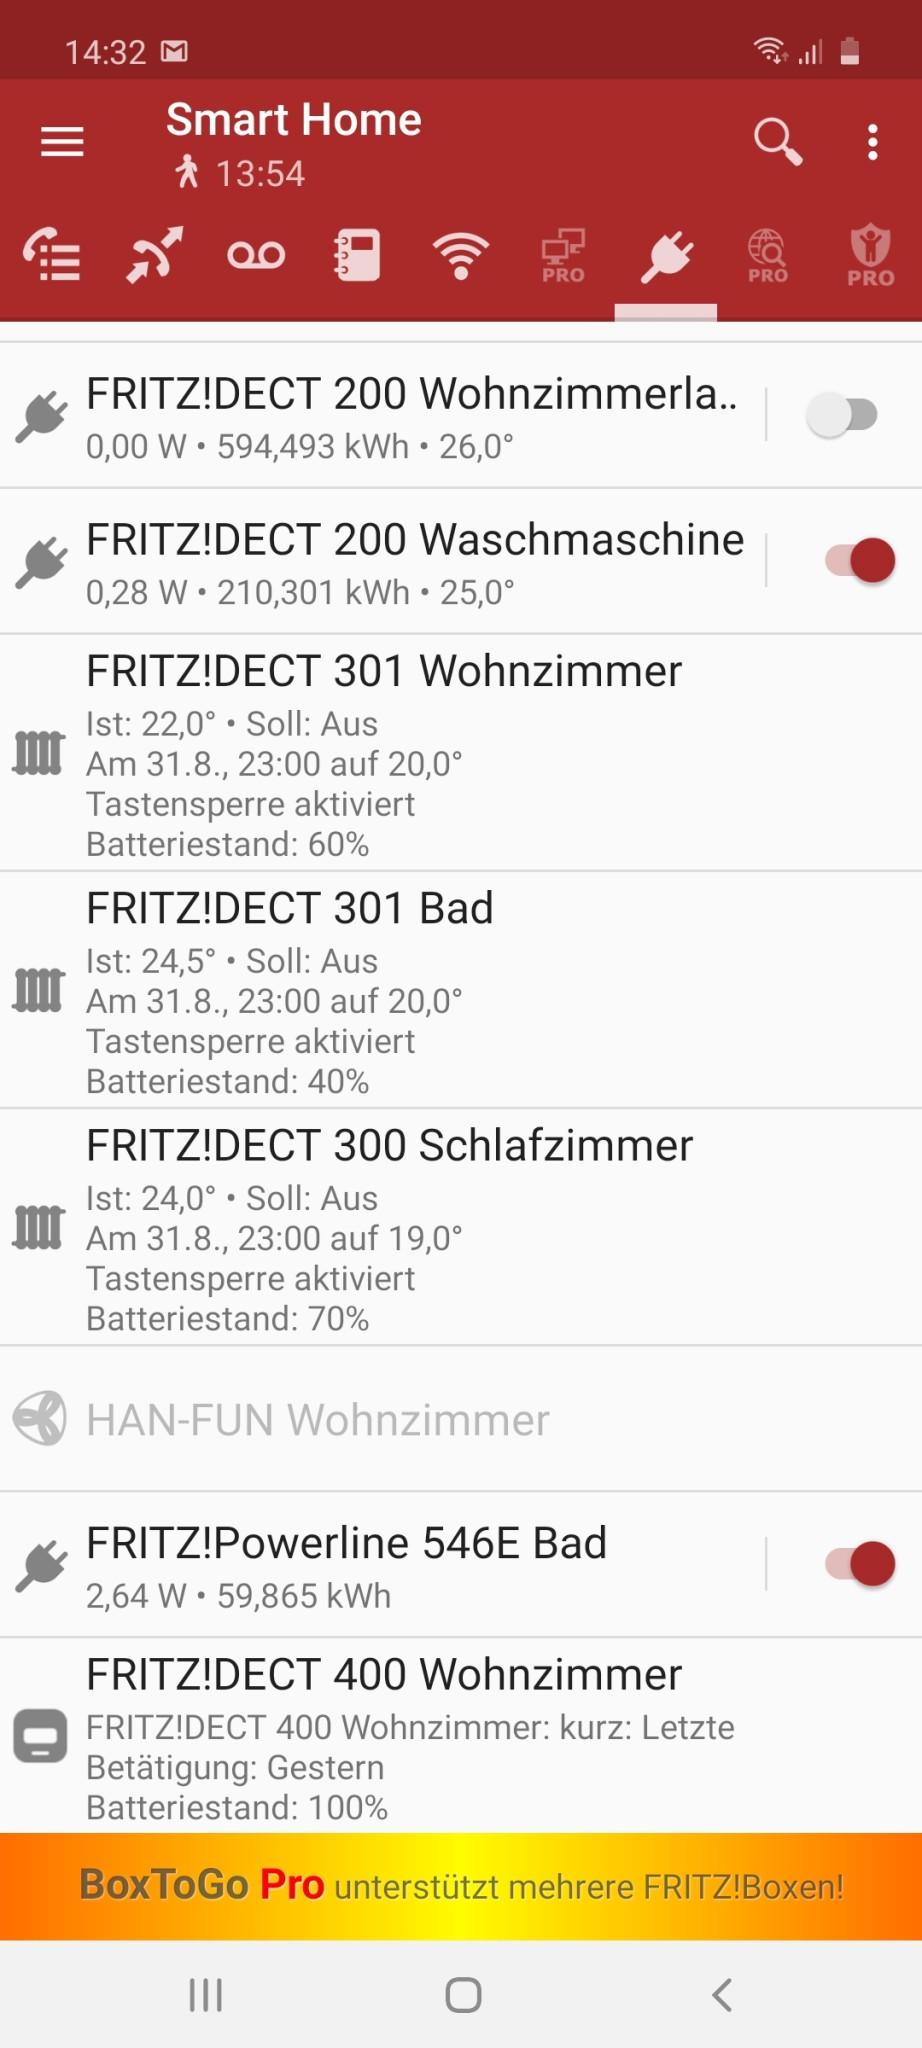 Screenshot 1 - BoxToGo Free (Android-App)